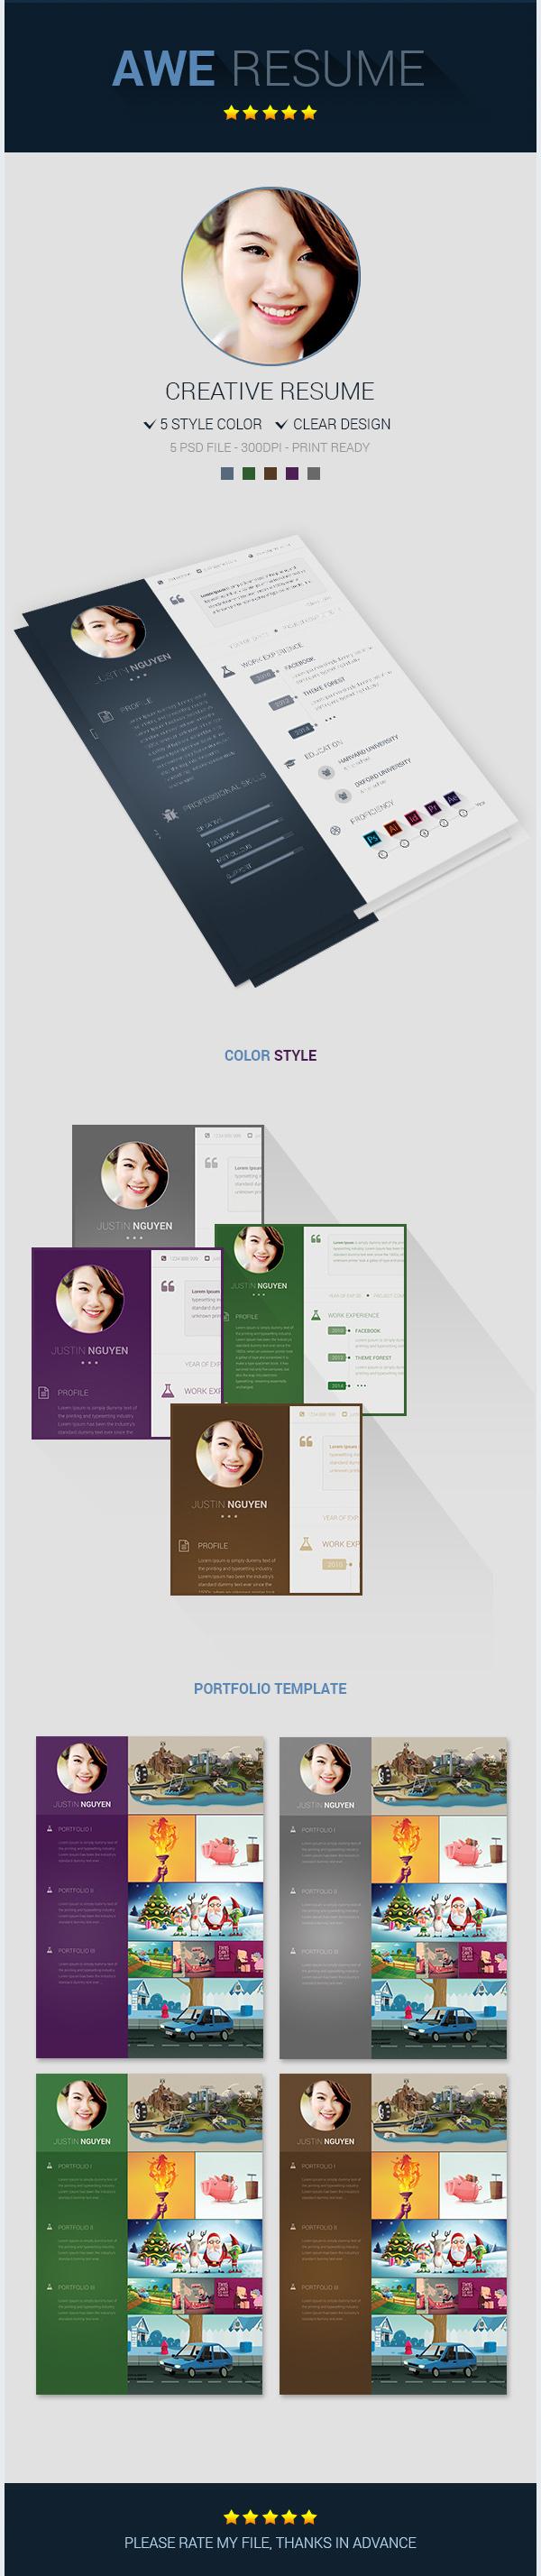 freebie psd premium resume template on behance